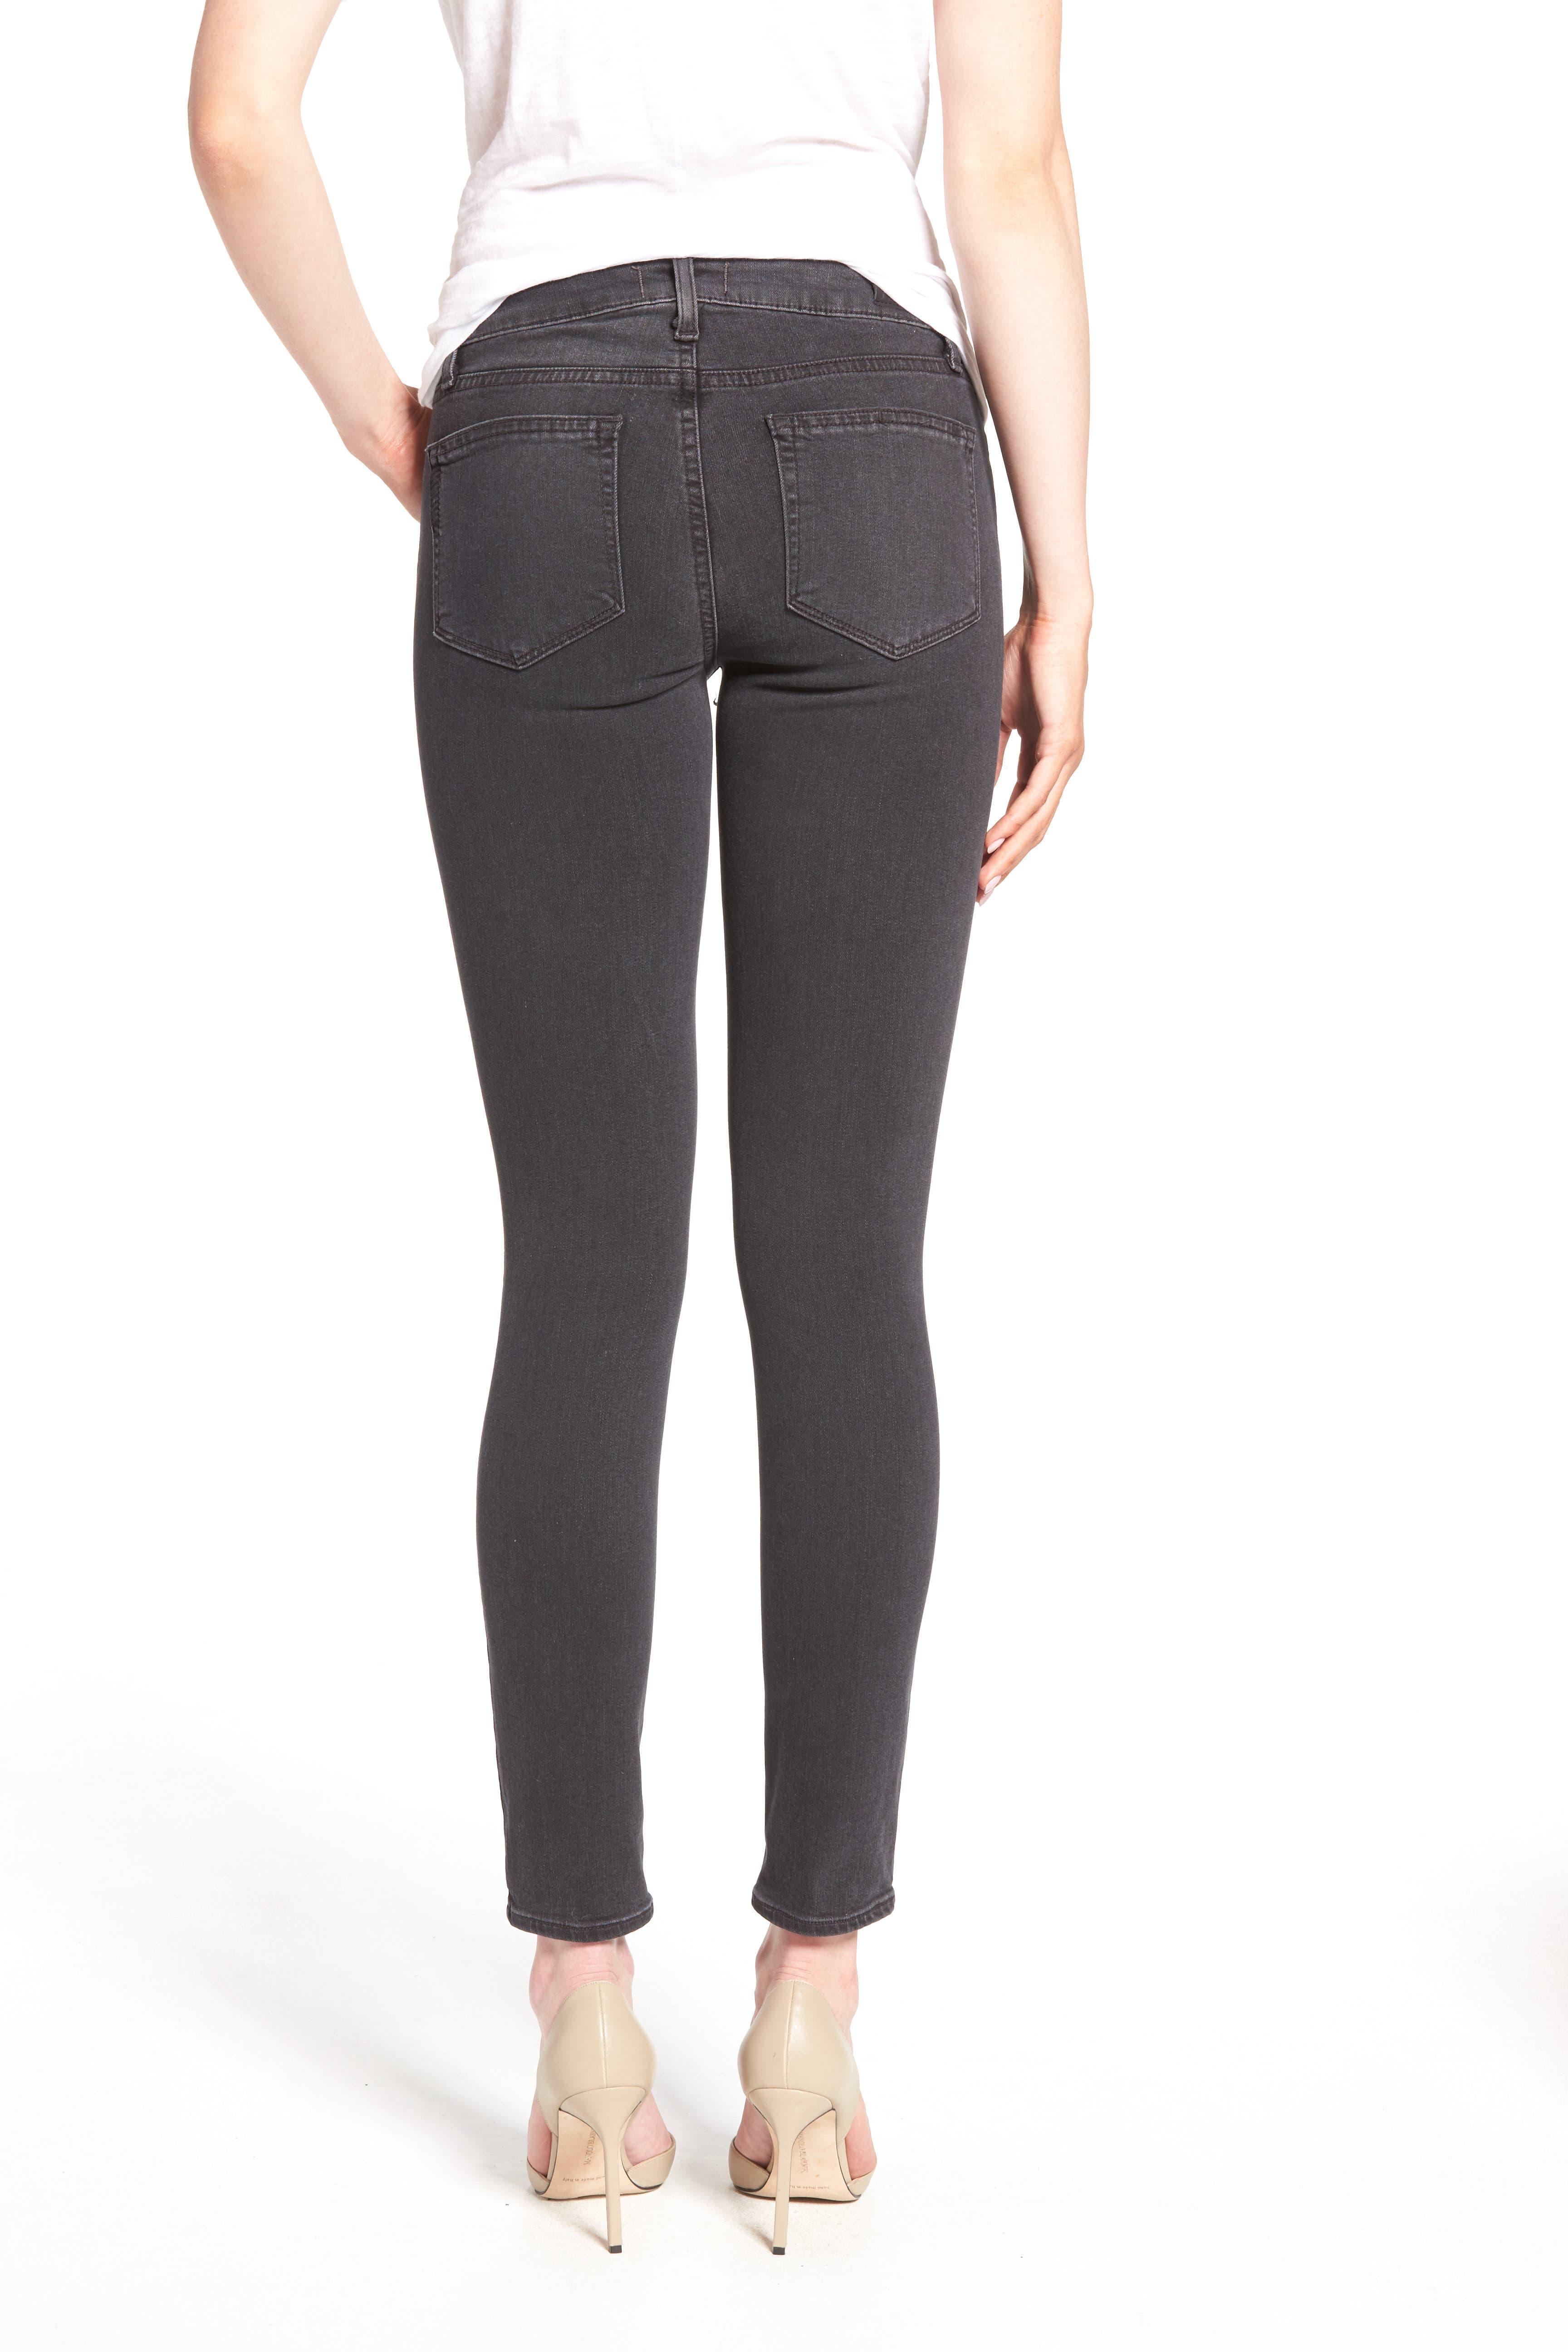 'Transcend - Verdugo' Ankle Skinny Jeans,                             Alternate thumbnail 3, color,                             020